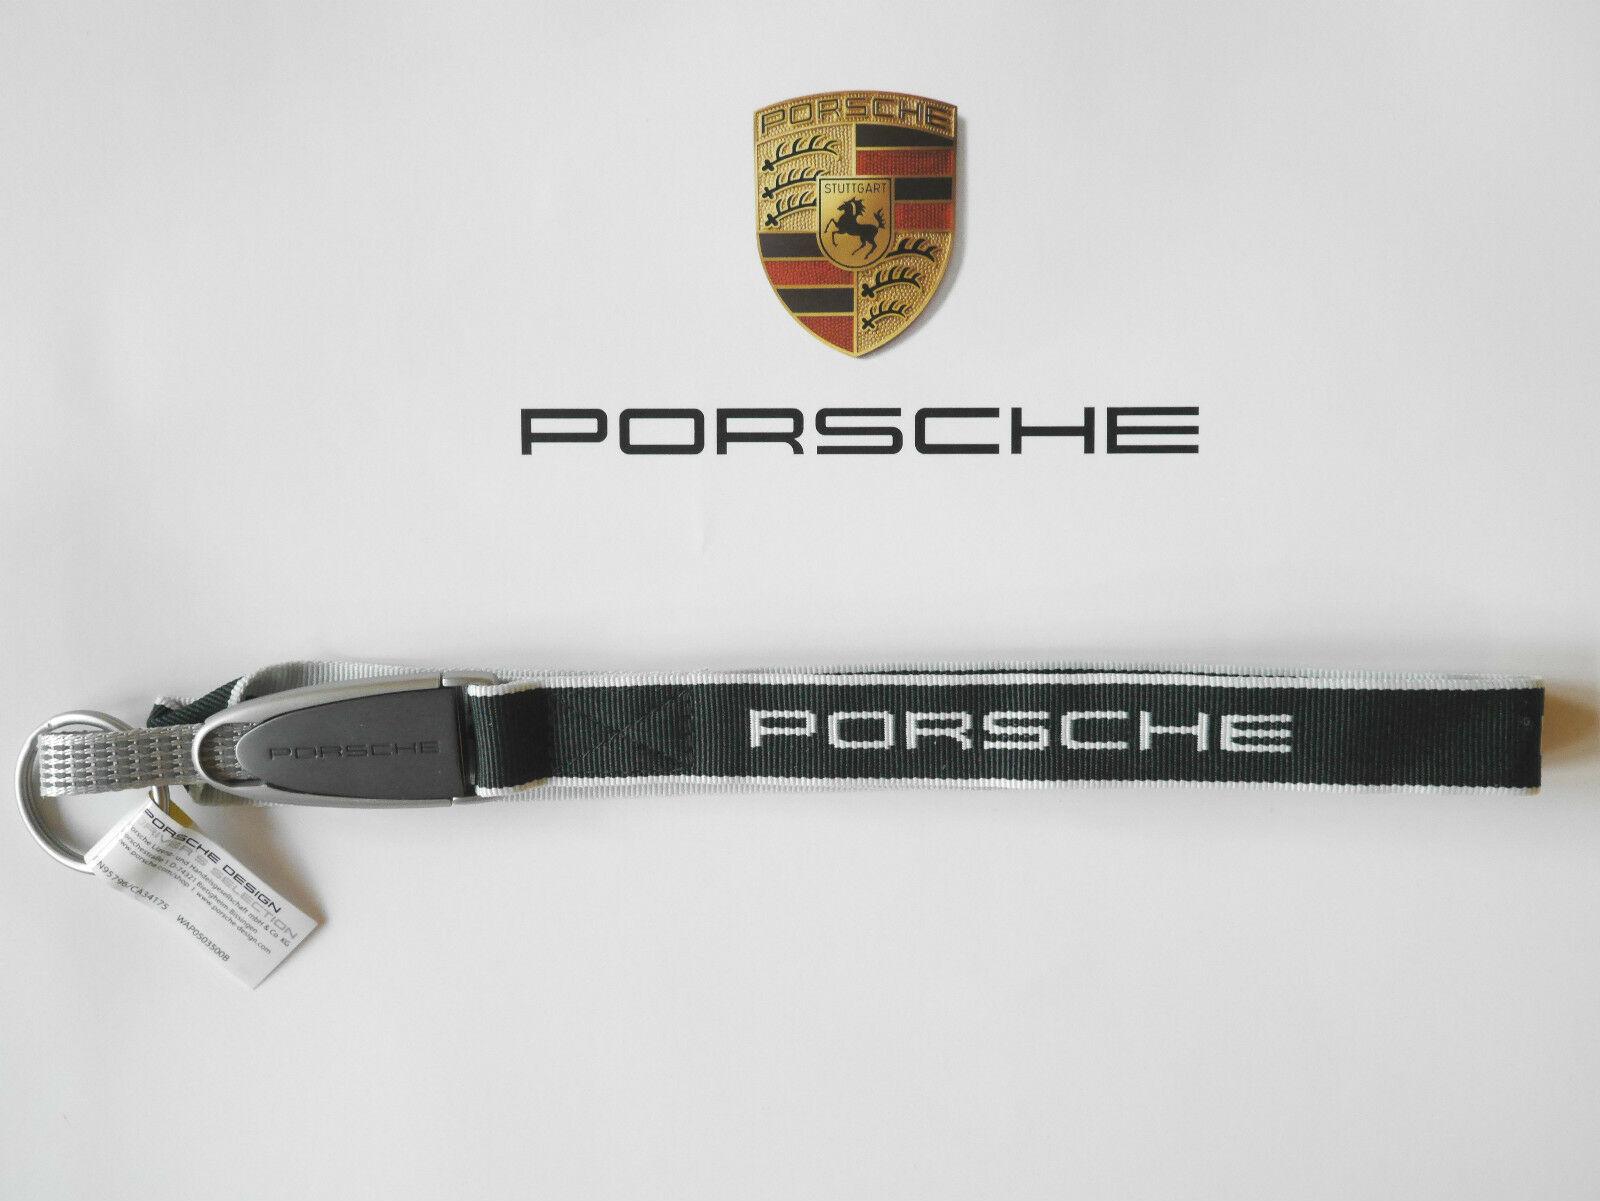 Porsche Drivers Selection: Schlüsselbänder Schlüsselanhänger